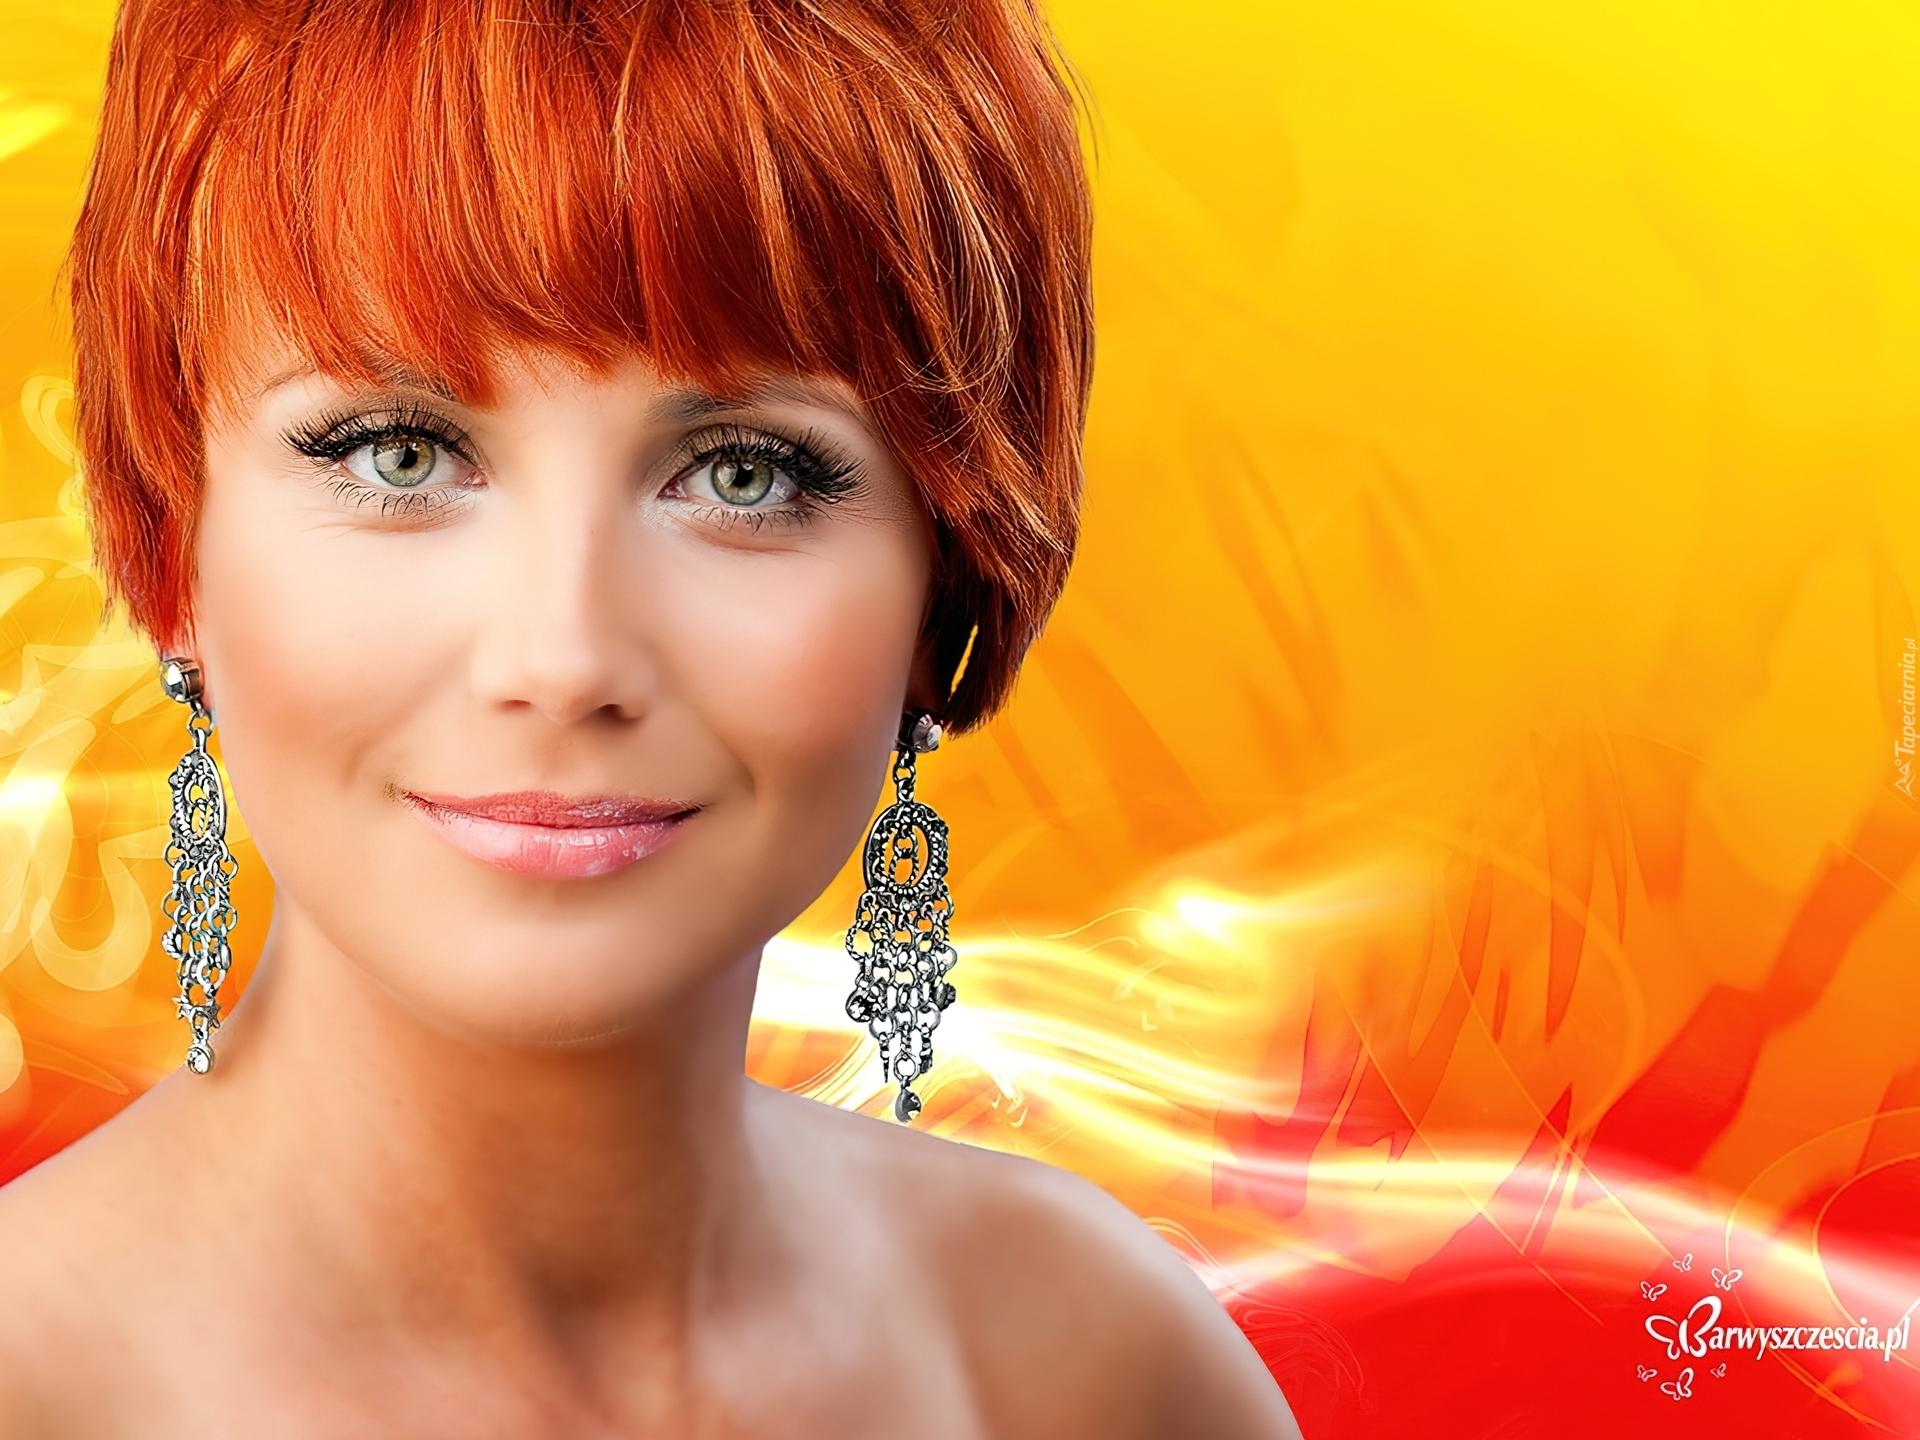 Katarzyna Zielinska nude 895